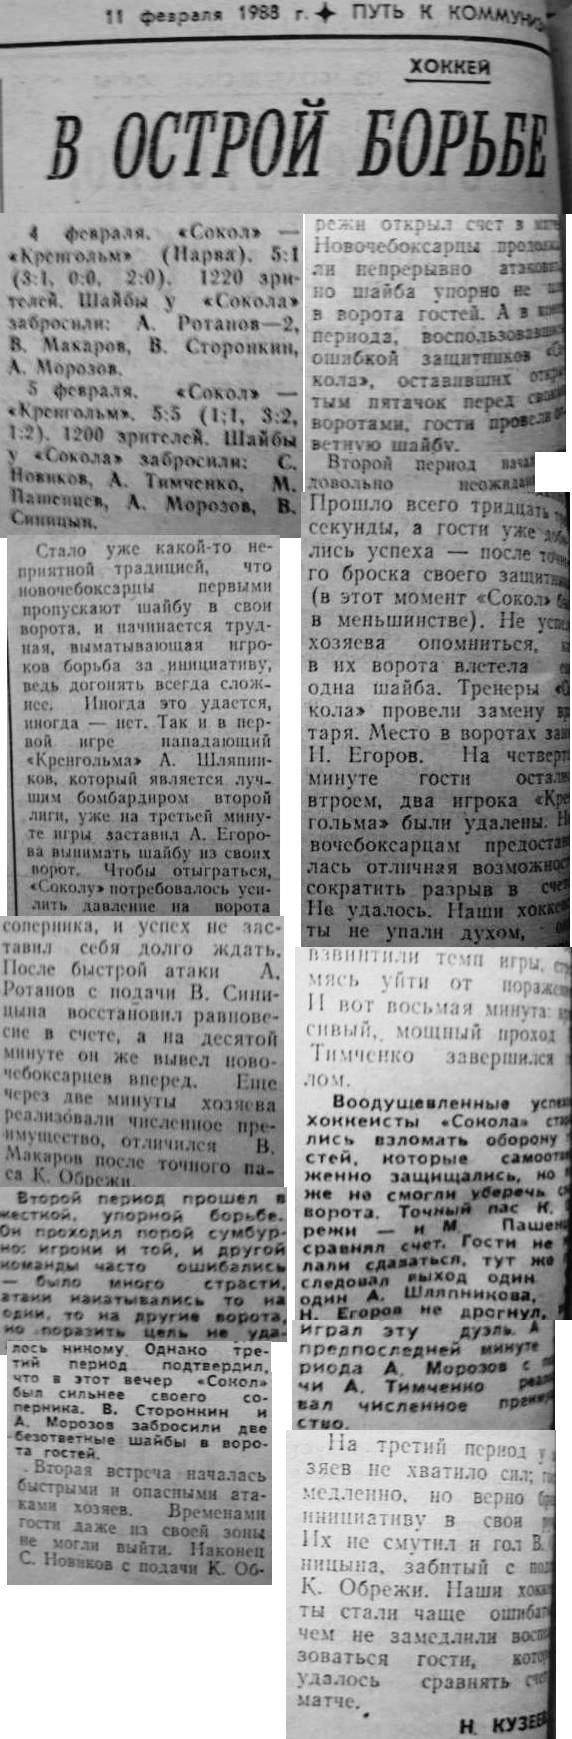 ПК 1988 02 04 Сокол Нарва.jpg